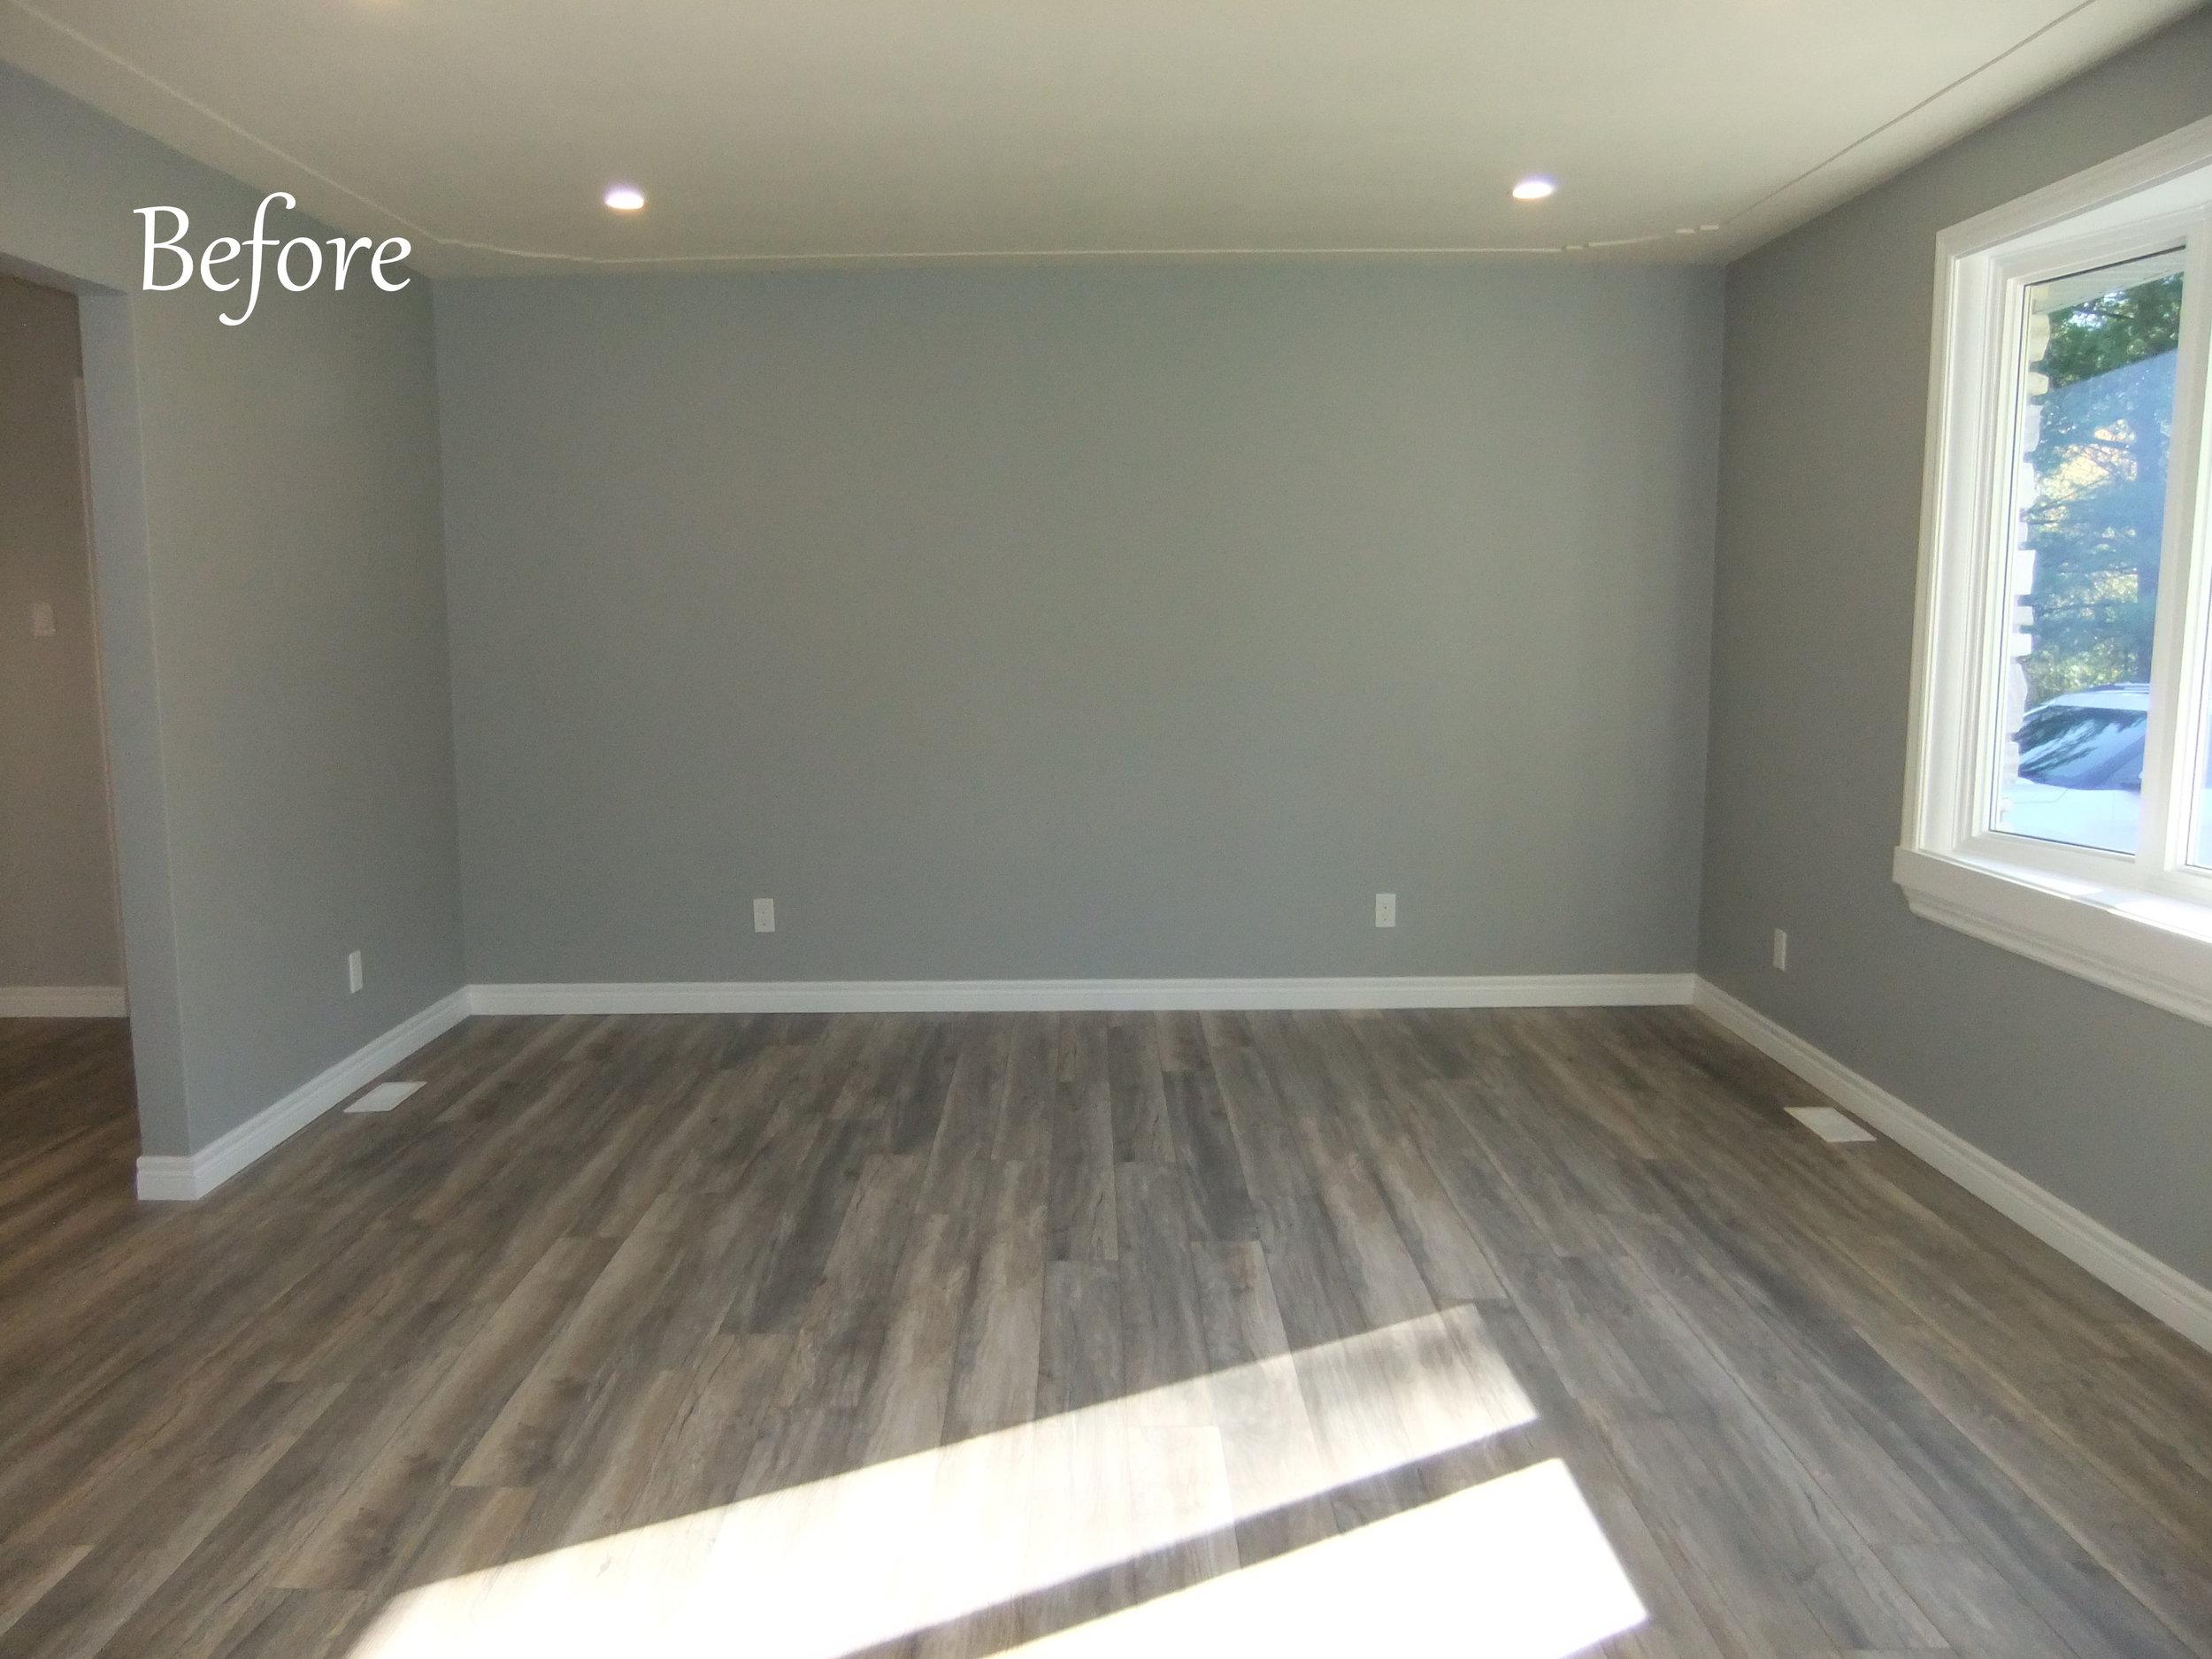 Livingroom 1 - Before 3.jpg